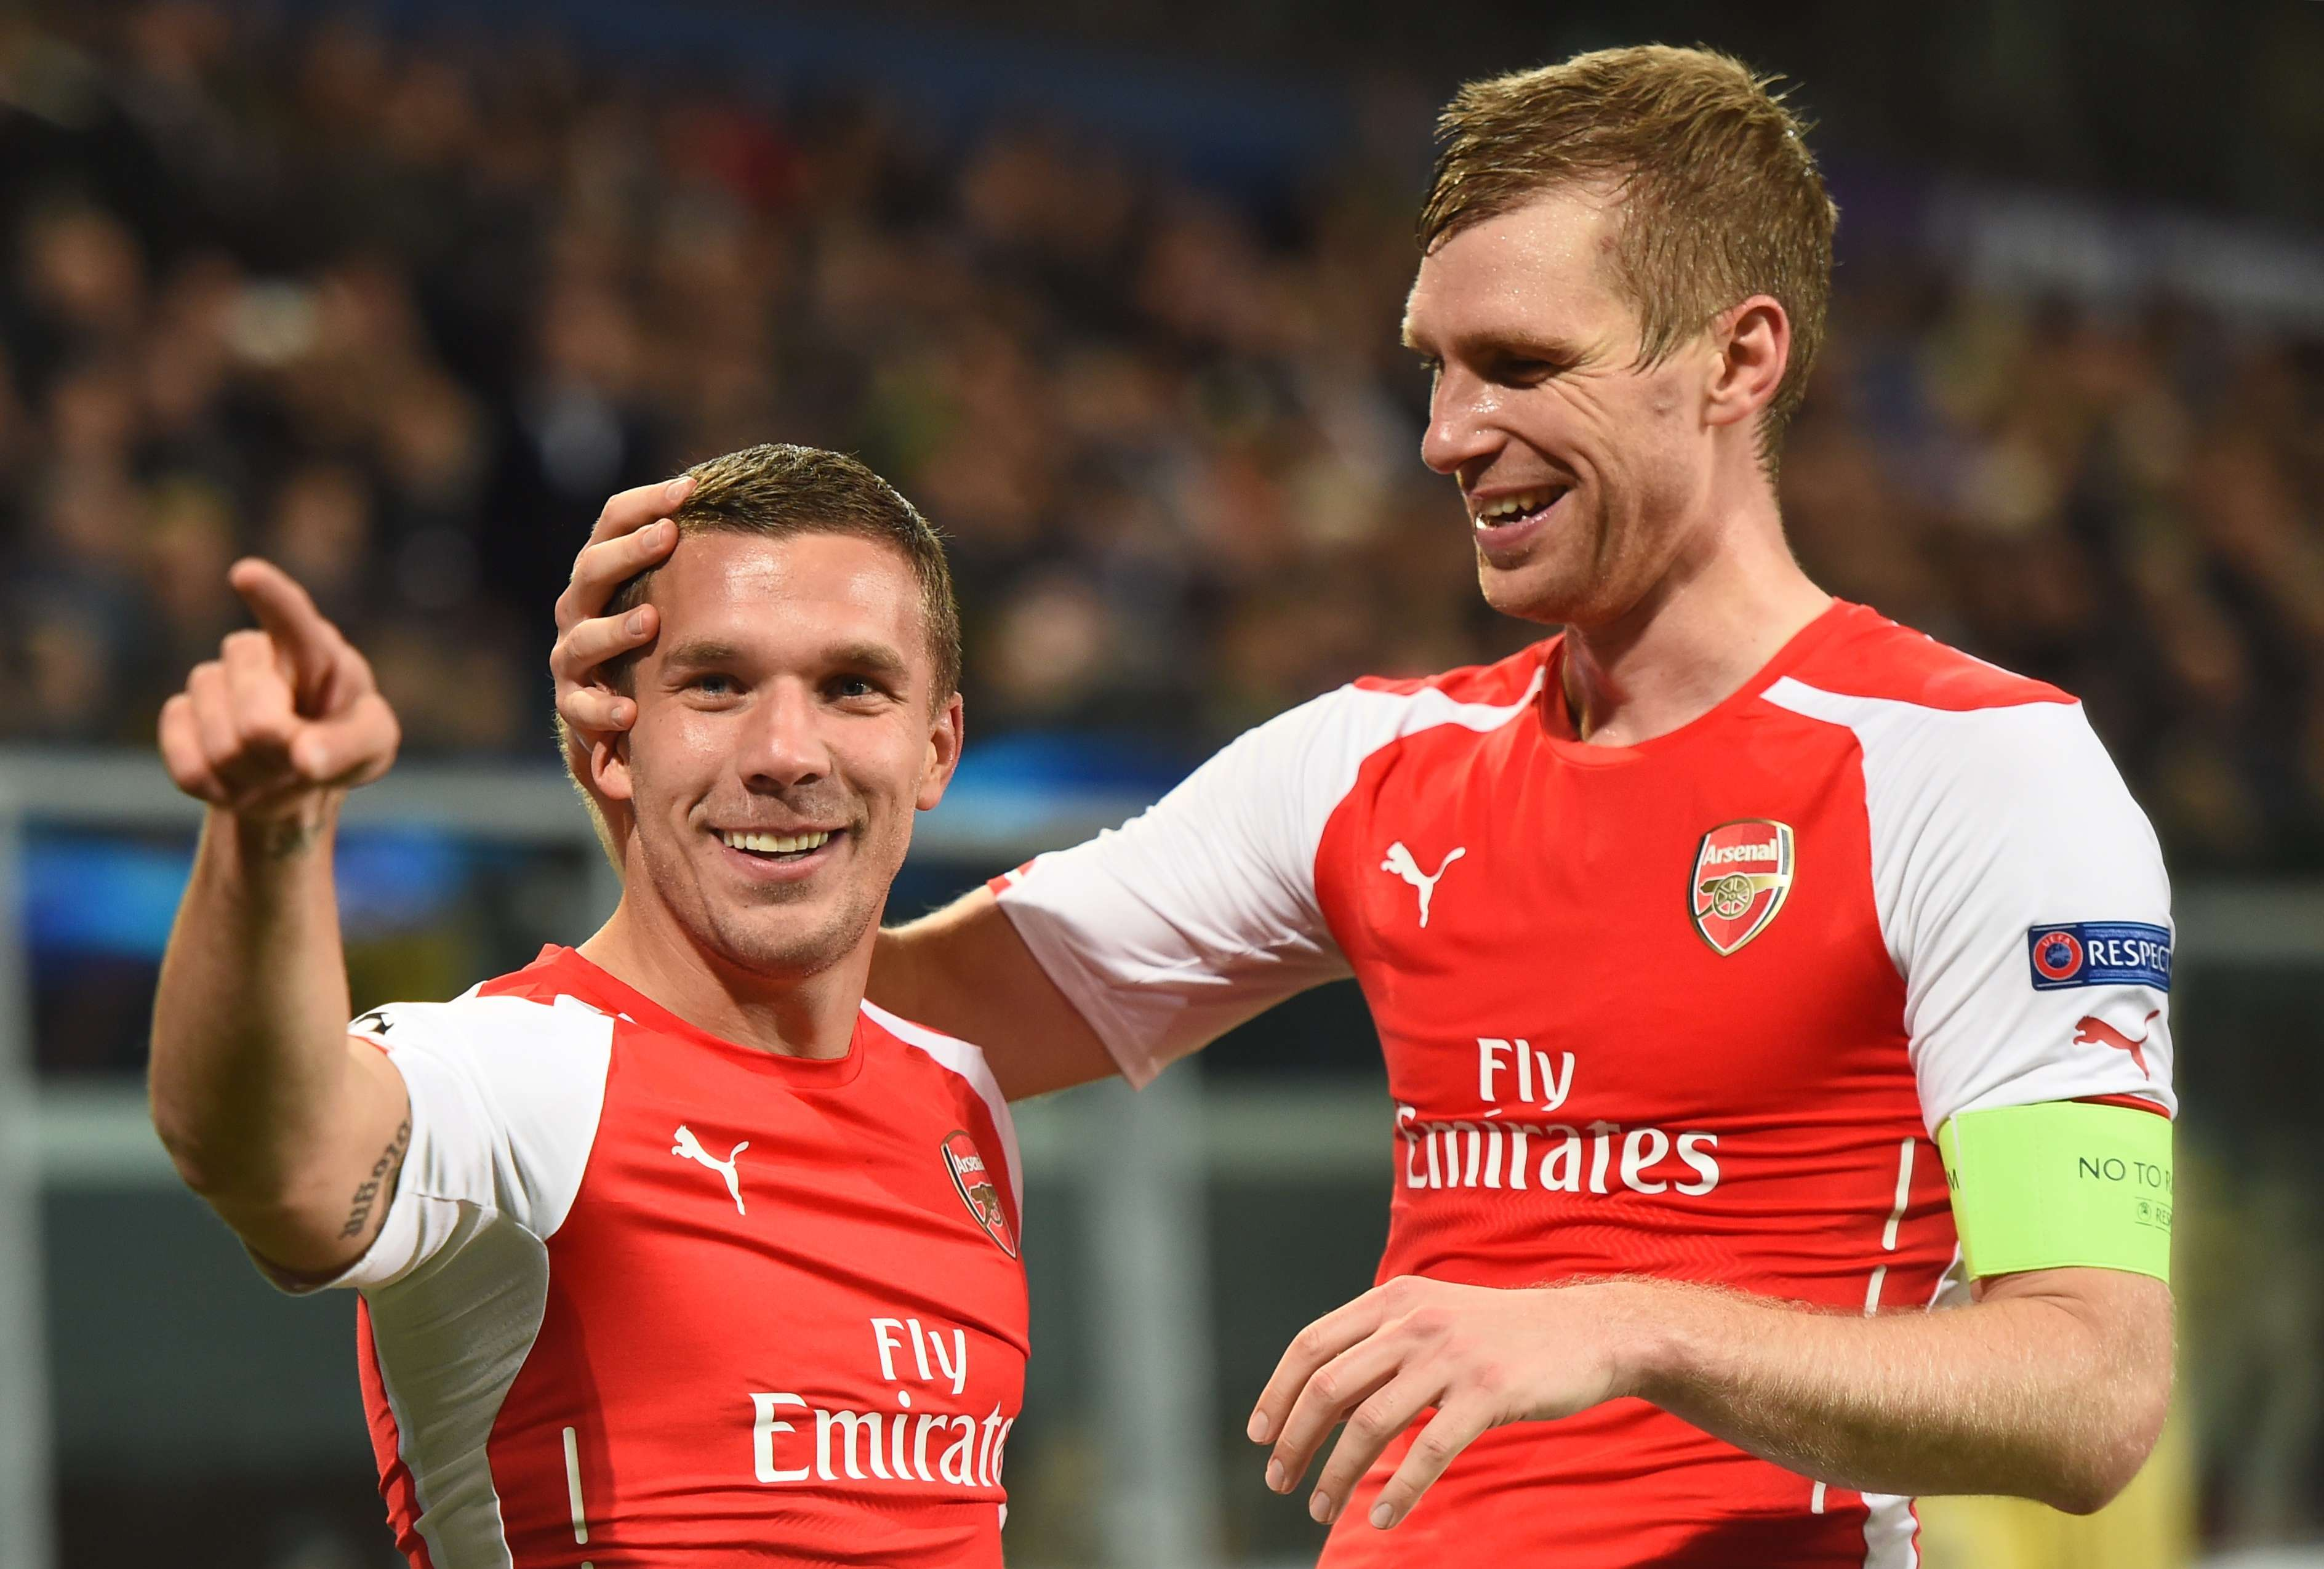 Arsenal conseguiu dois gols nos minutos finais para sair com virada Foto: Emmanuel Dunand/AFP